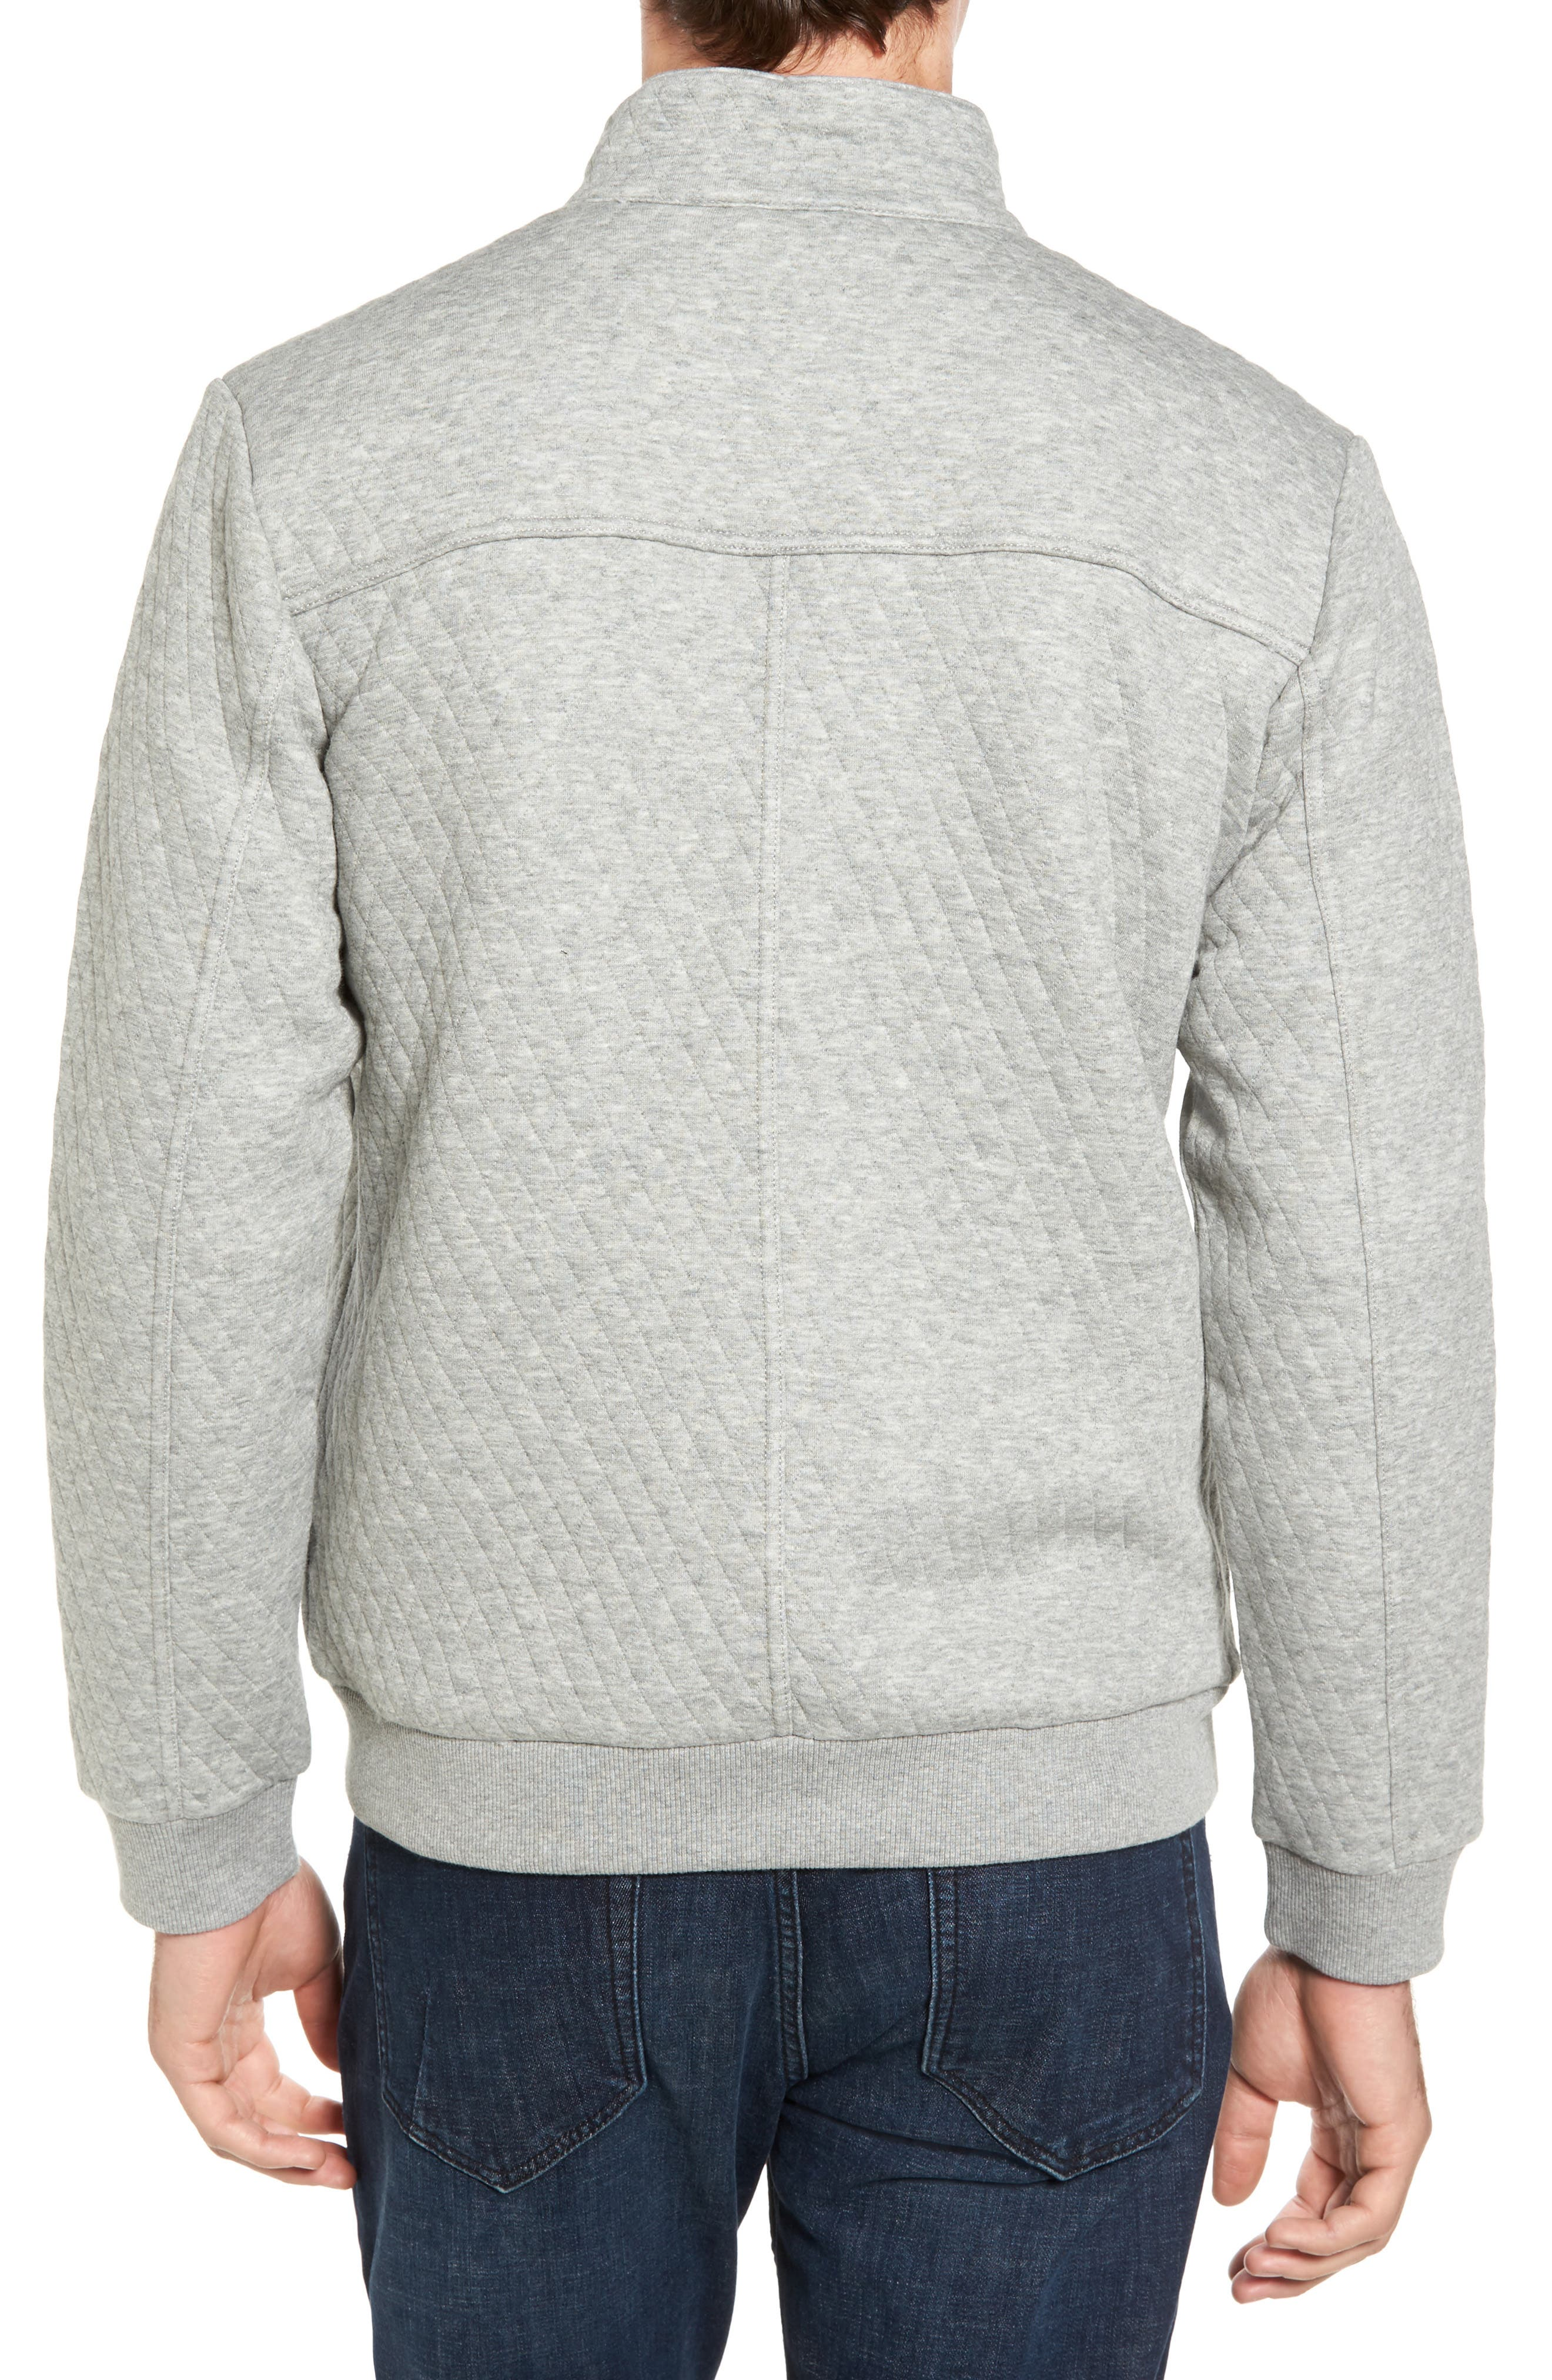 RODD & GUNN, Skipjack Pass Quilted Fleece Jacket, Alternate thumbnail 2, color, ASH